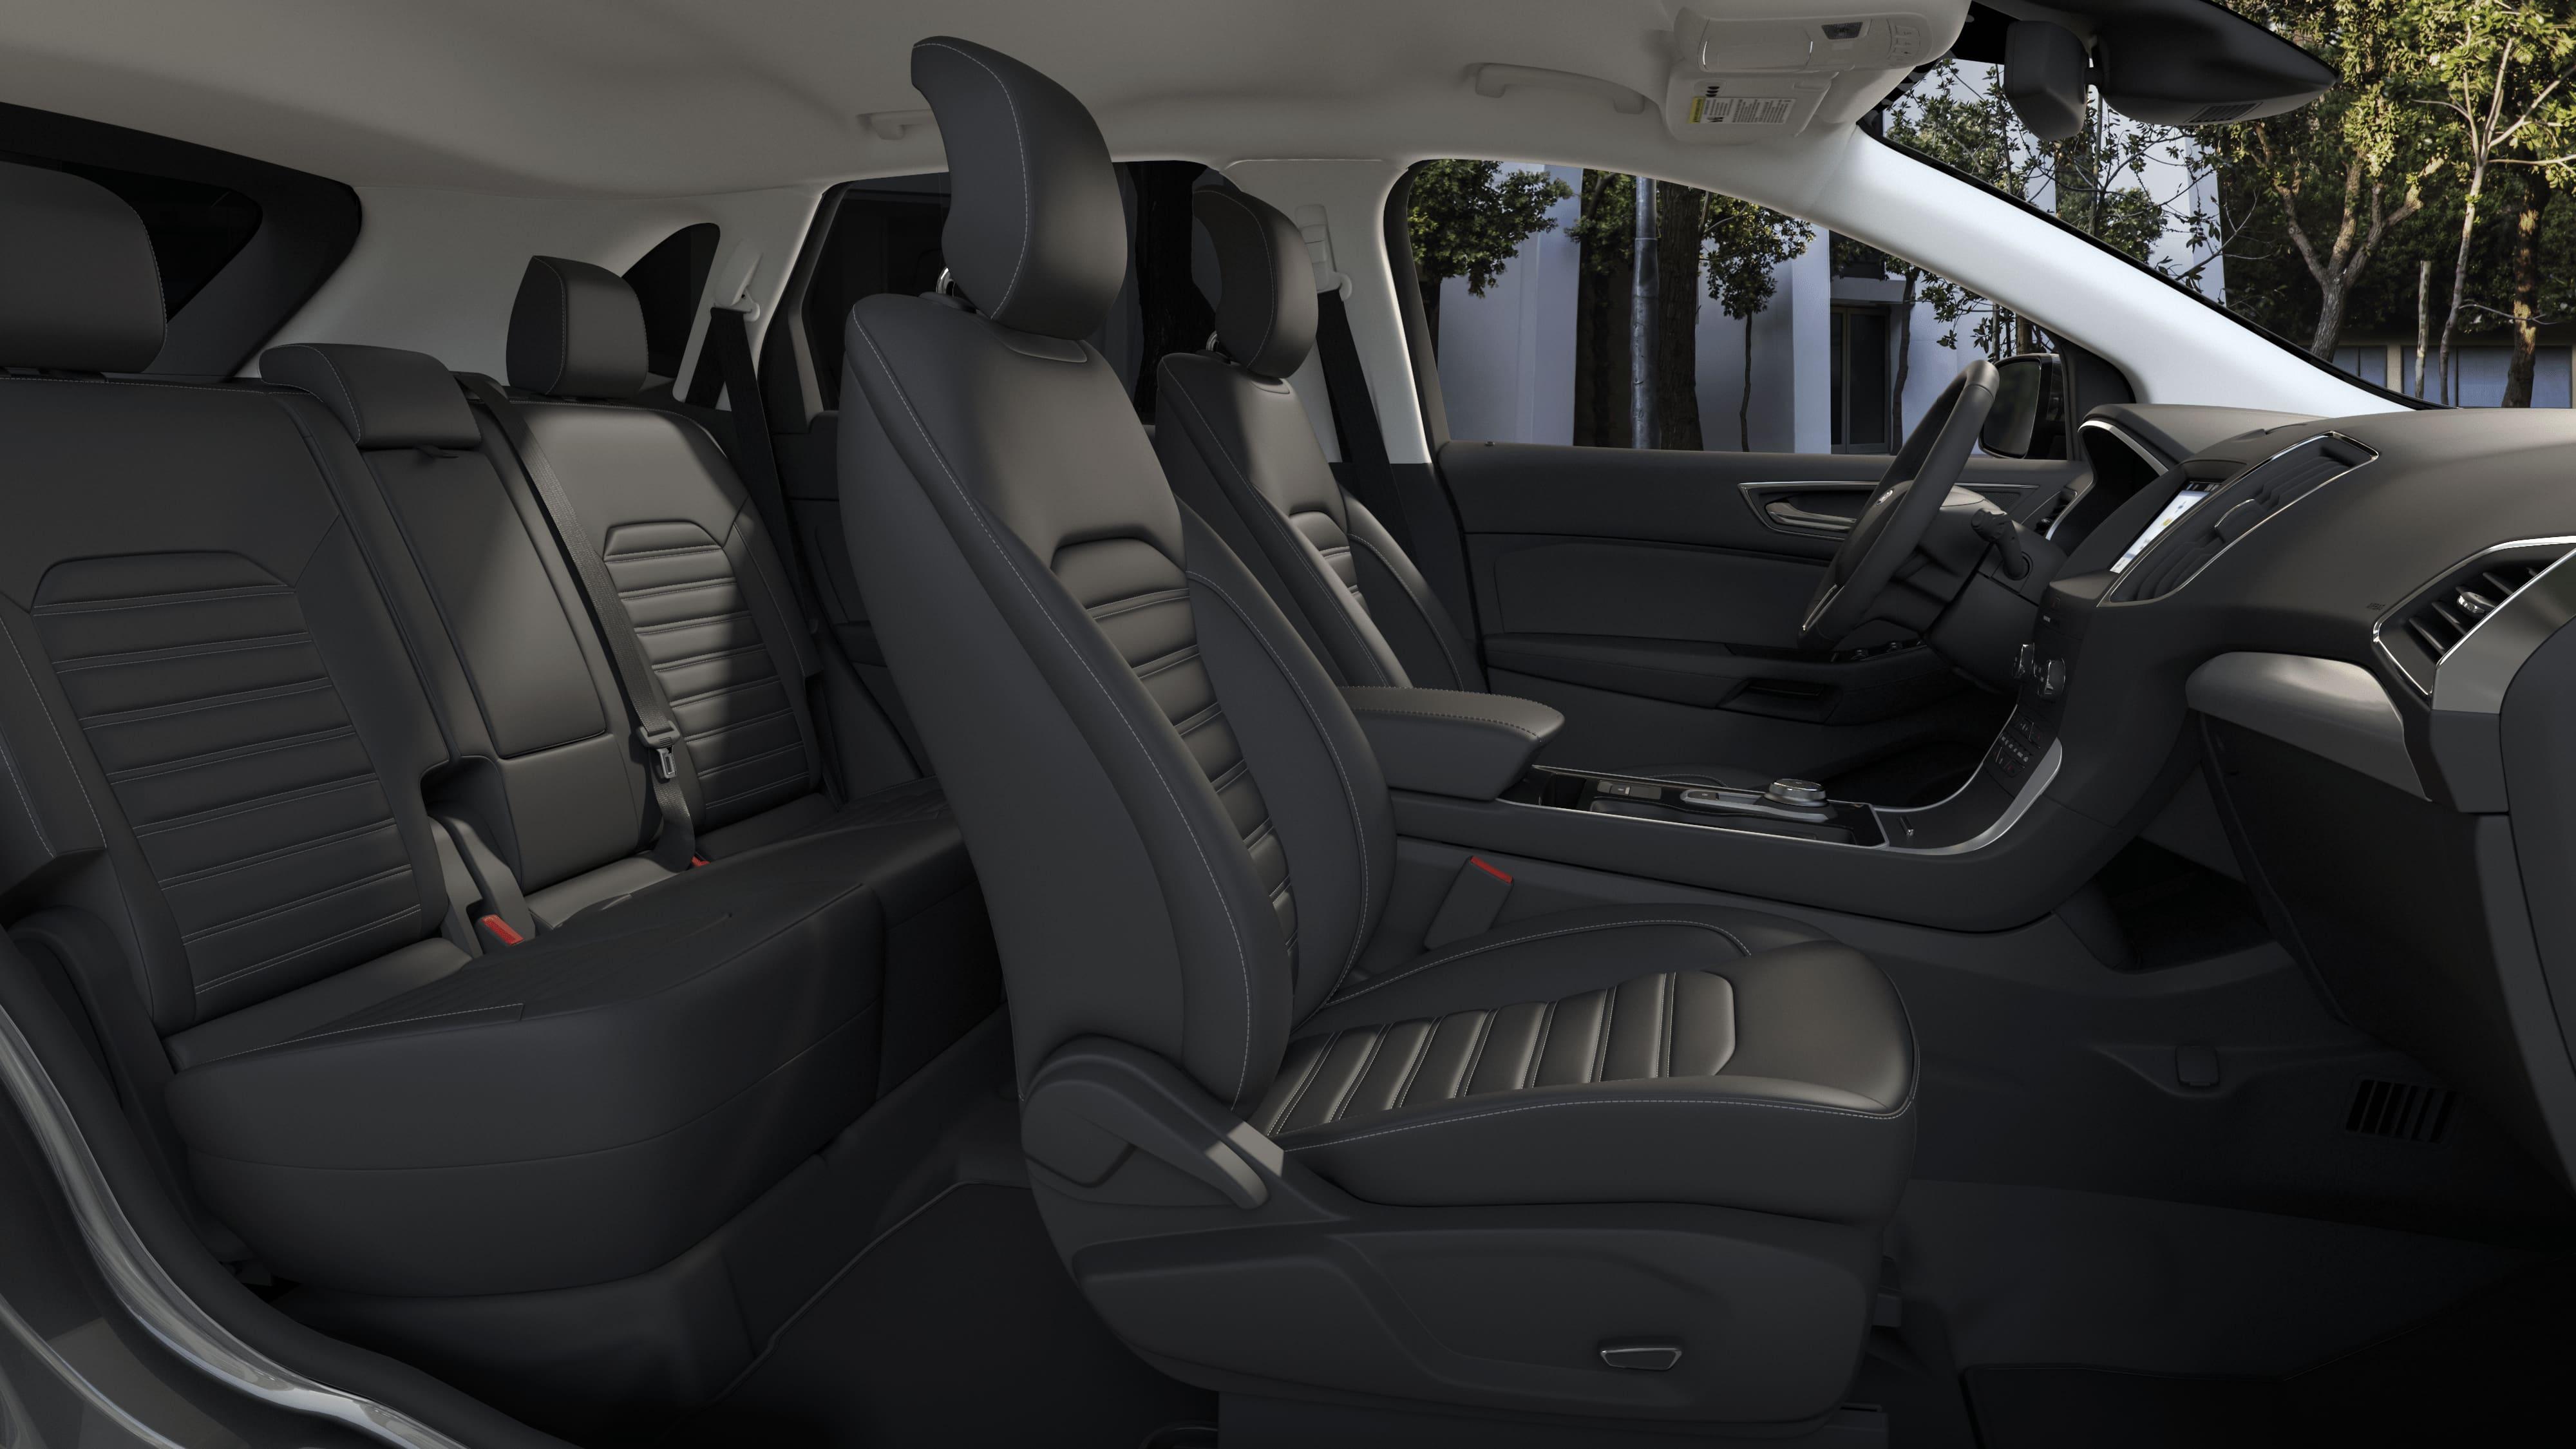 2019 Ford Edge for sale in Aberdeen - 2FMPK4J90KBB12047 - Hinder